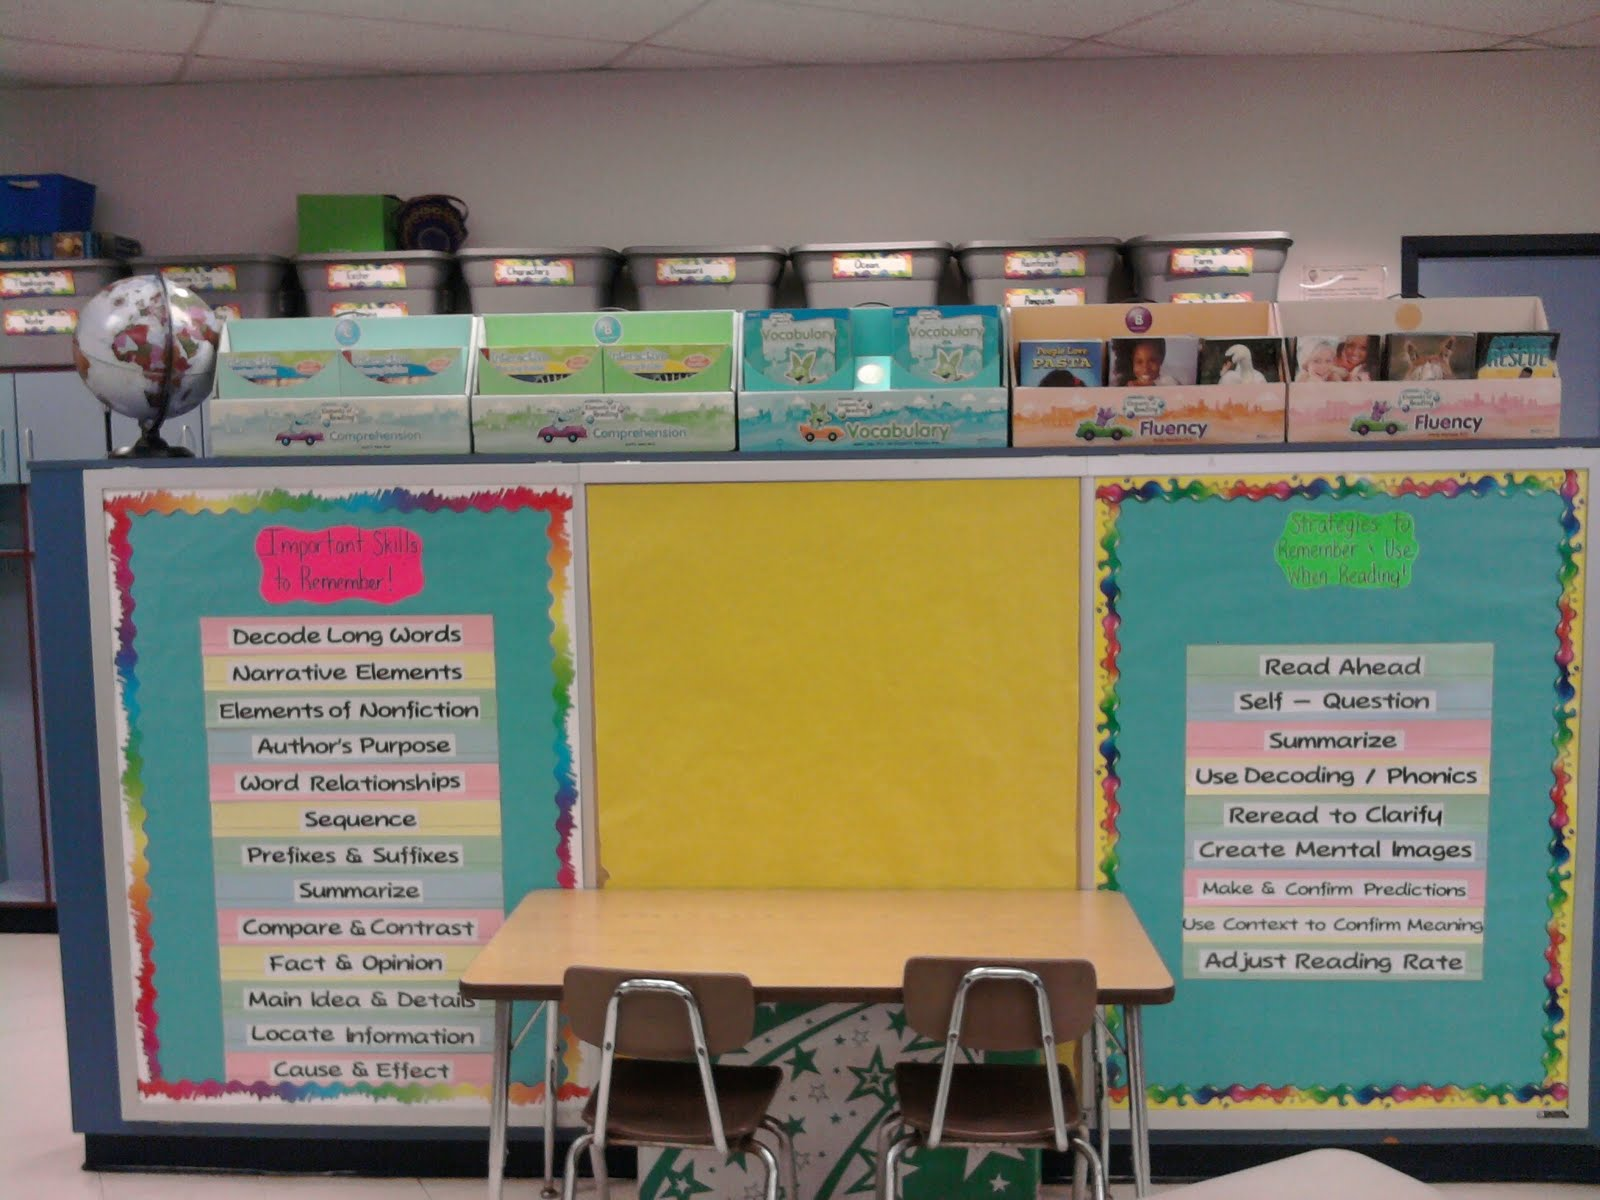 3rd Grade Classroom Design Ideas : Rd grade randomness classroom pictures finally